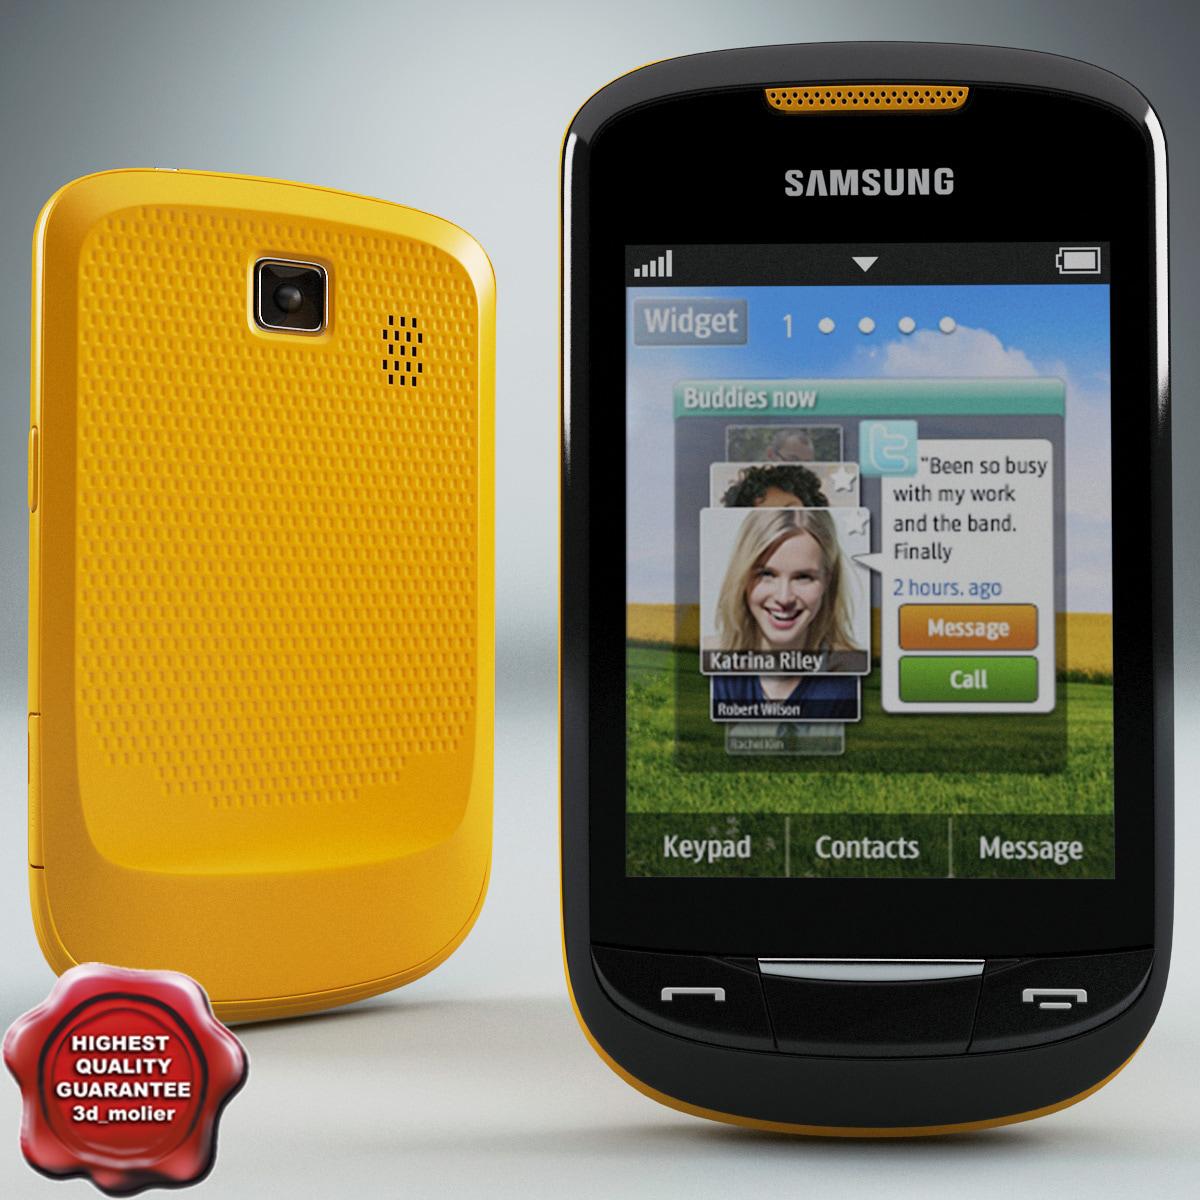 Samsung_S3850_Corby_II_Yellow_00.jpg